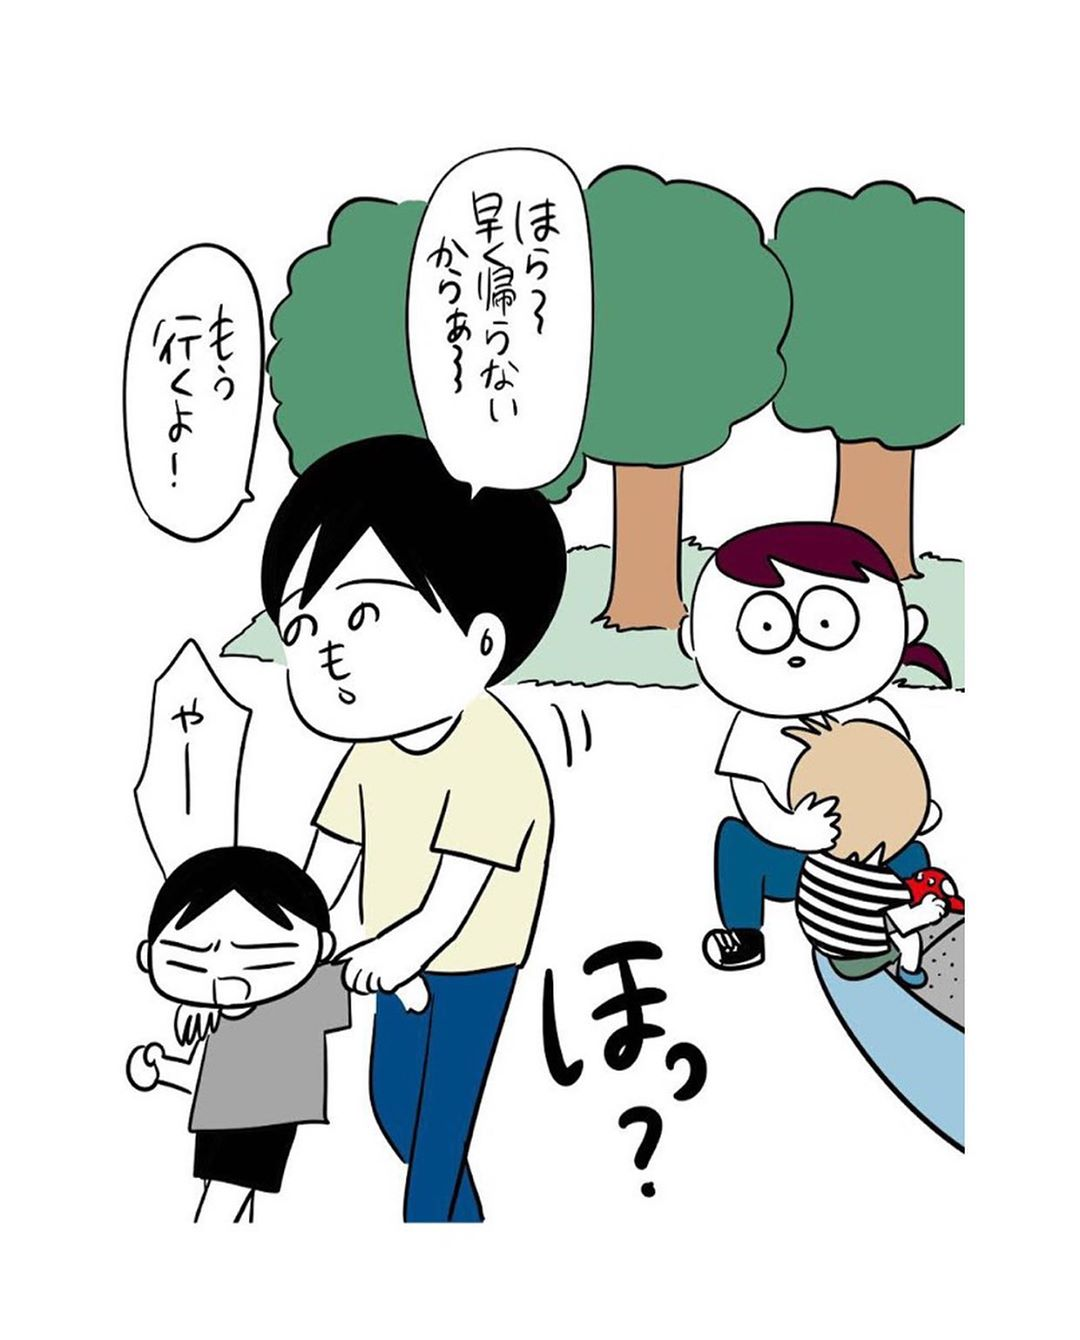 shirota.yunya_74573907_1562798590529710_3117858837655236535_n